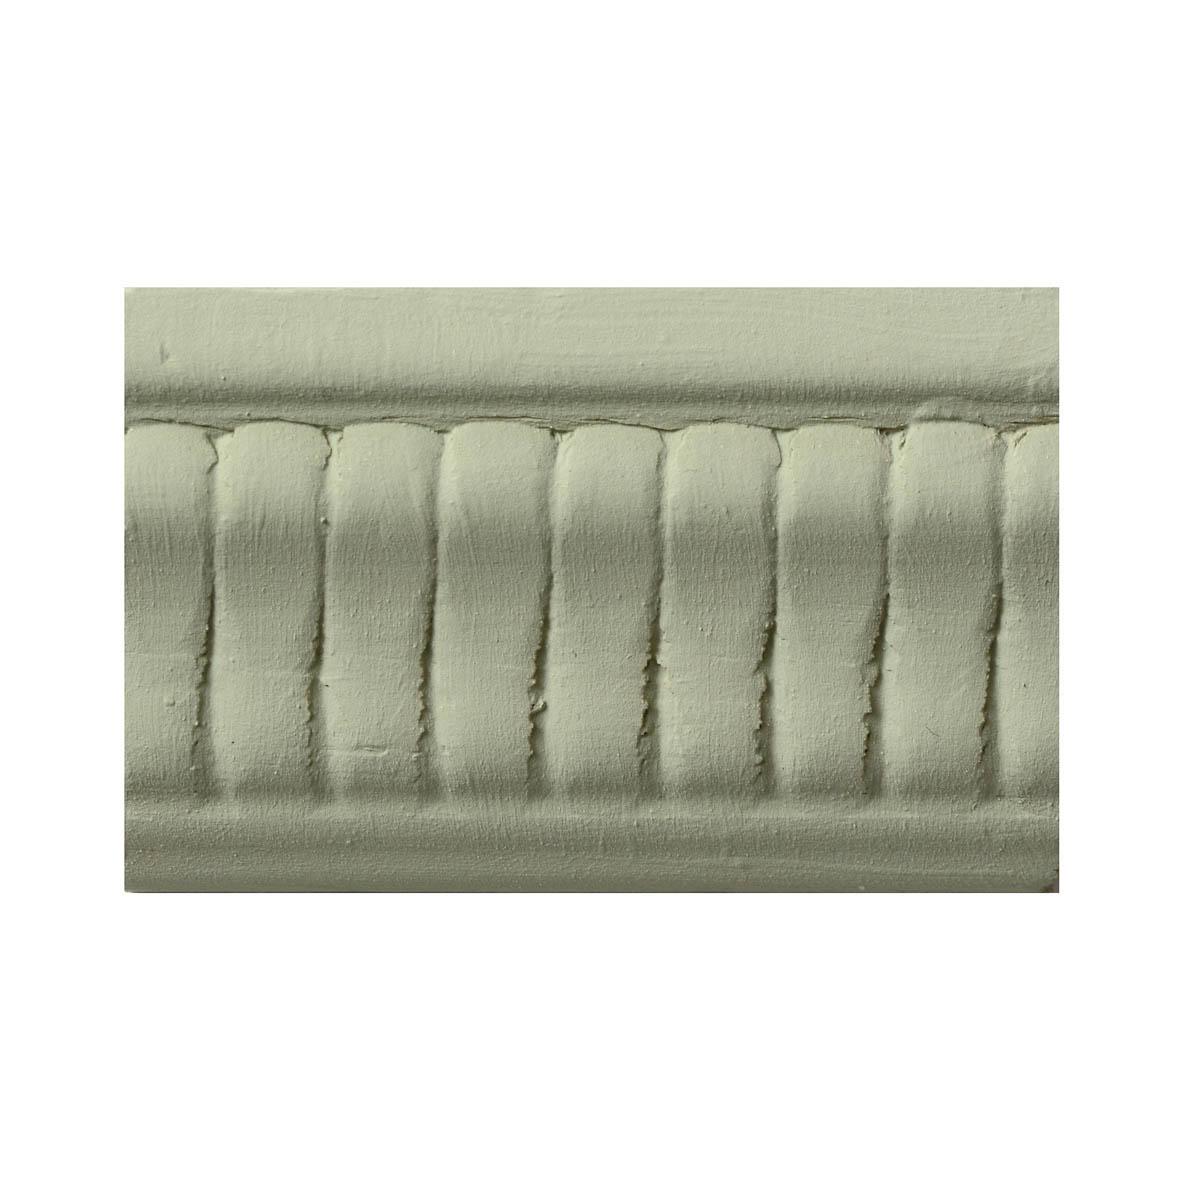 Waverly ® Inspirations Chalk Acrylic Paint - Celery, 8 oz. - 60720E